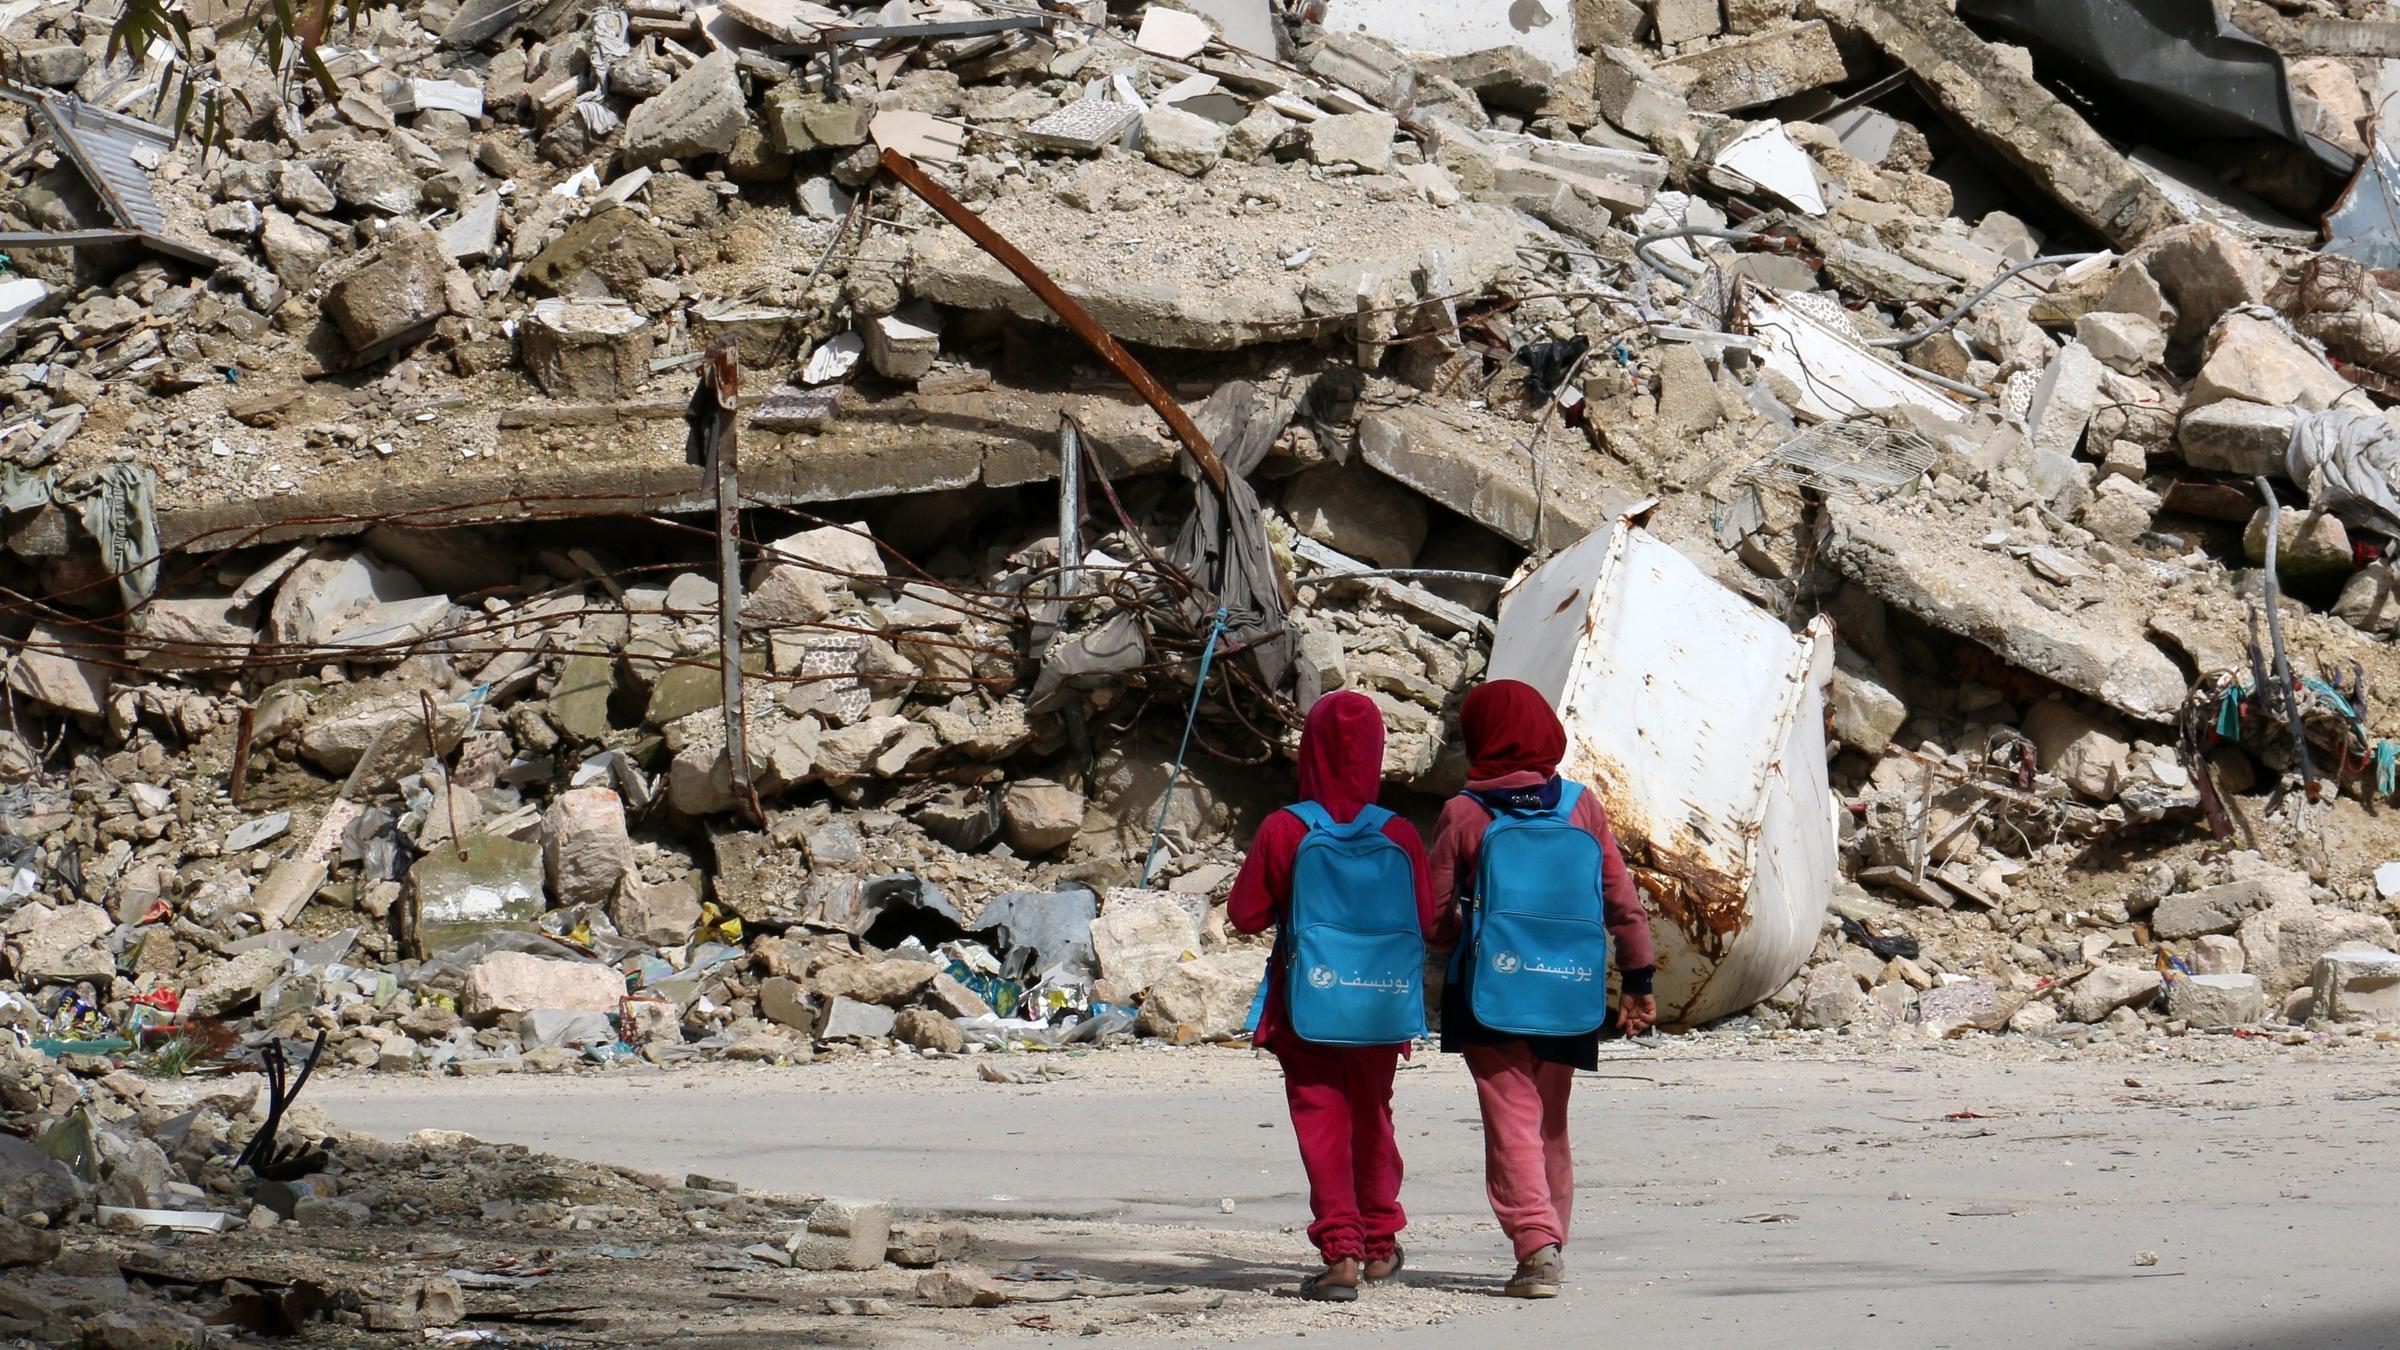 Syria's War News